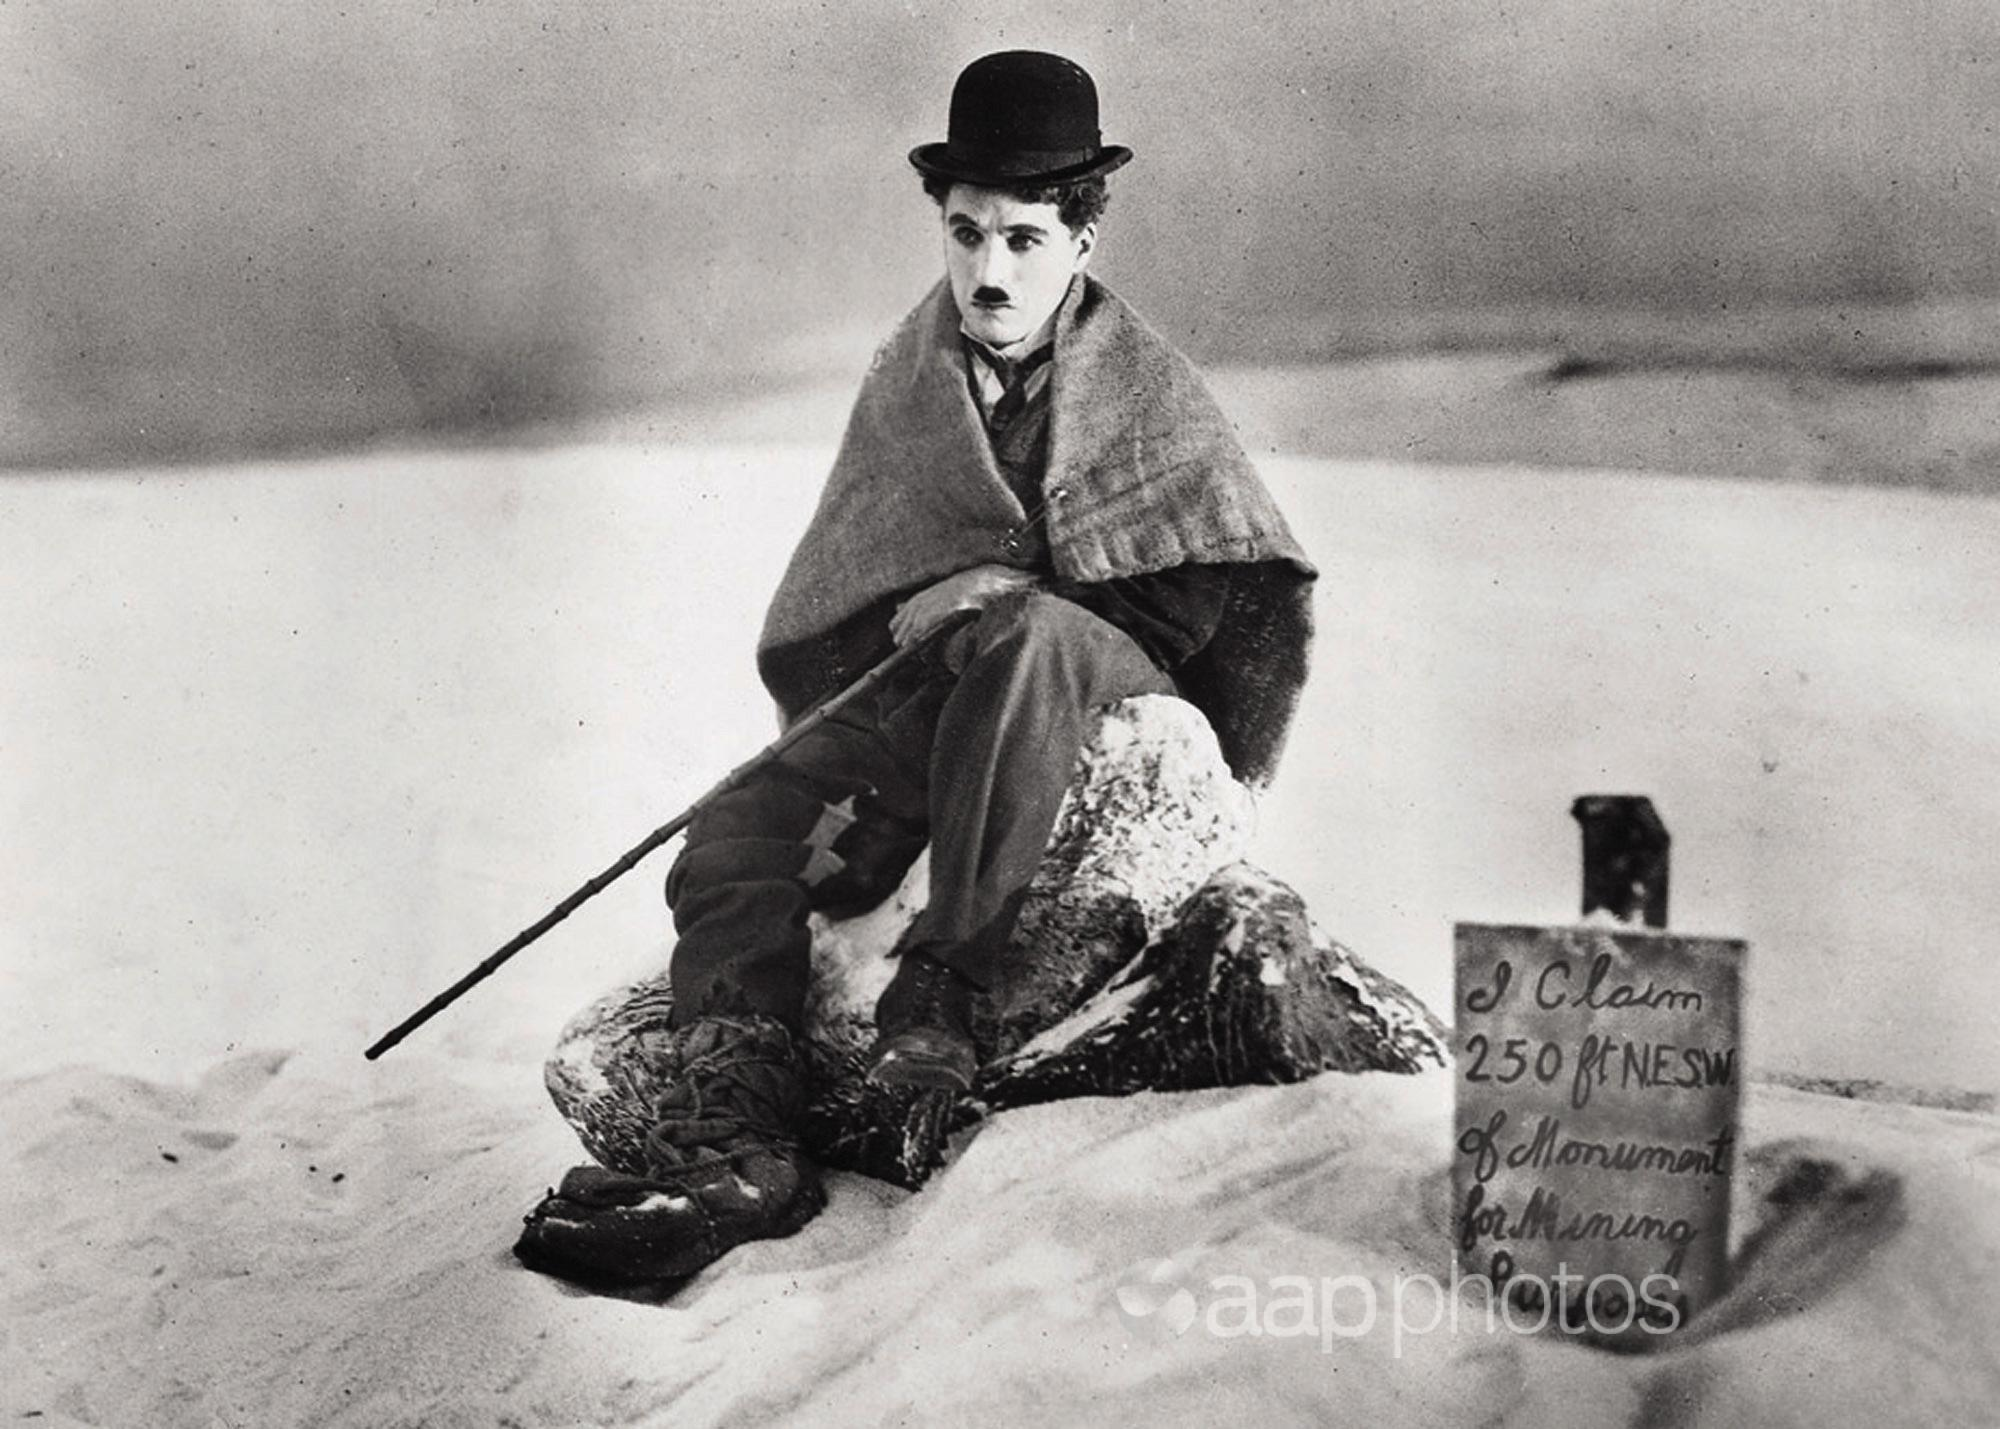 Actor-director Charlie Chaplin